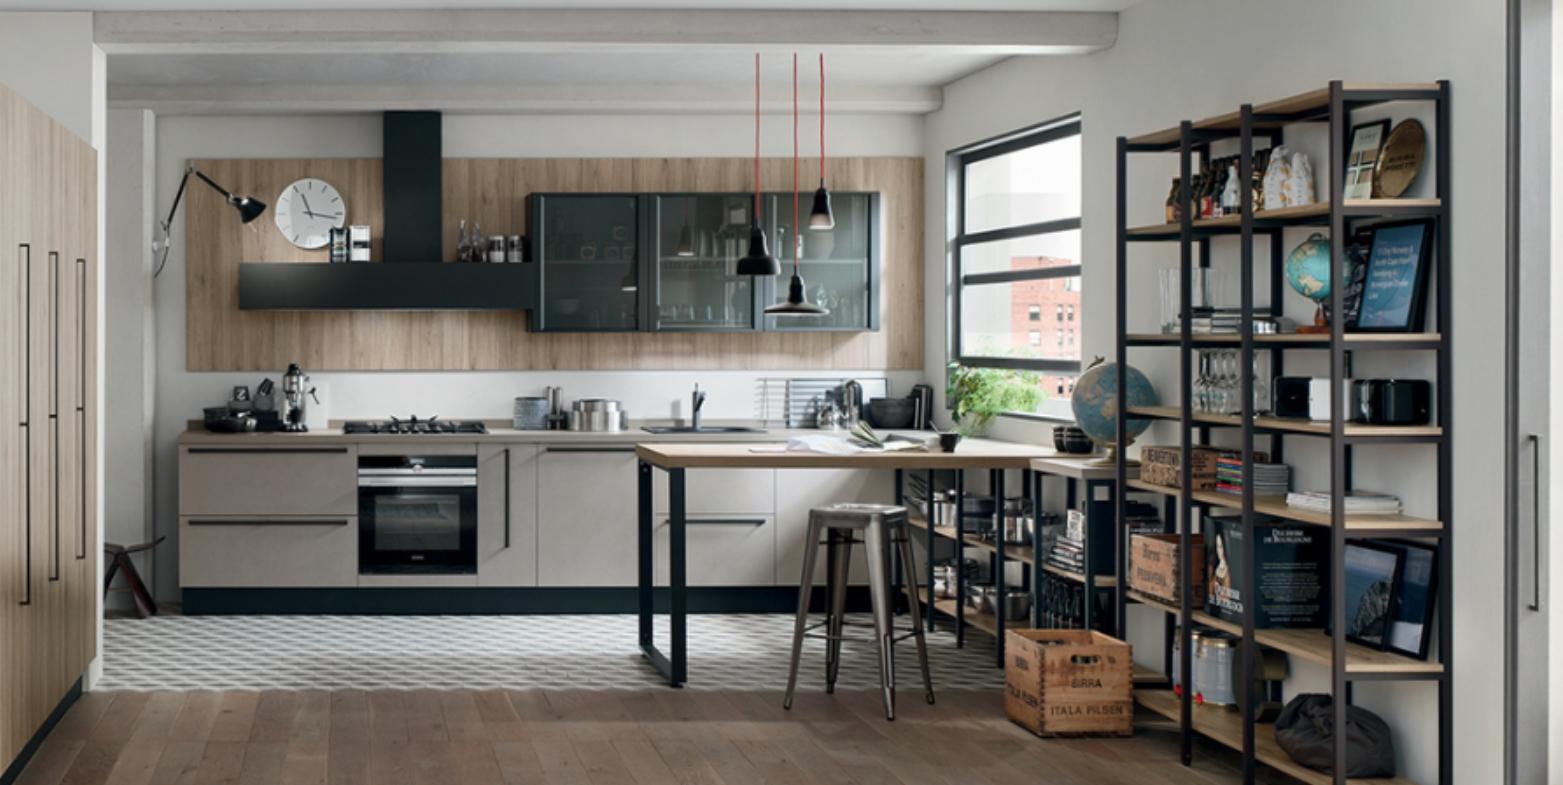 Cucine - Prezioso casa cucine ...